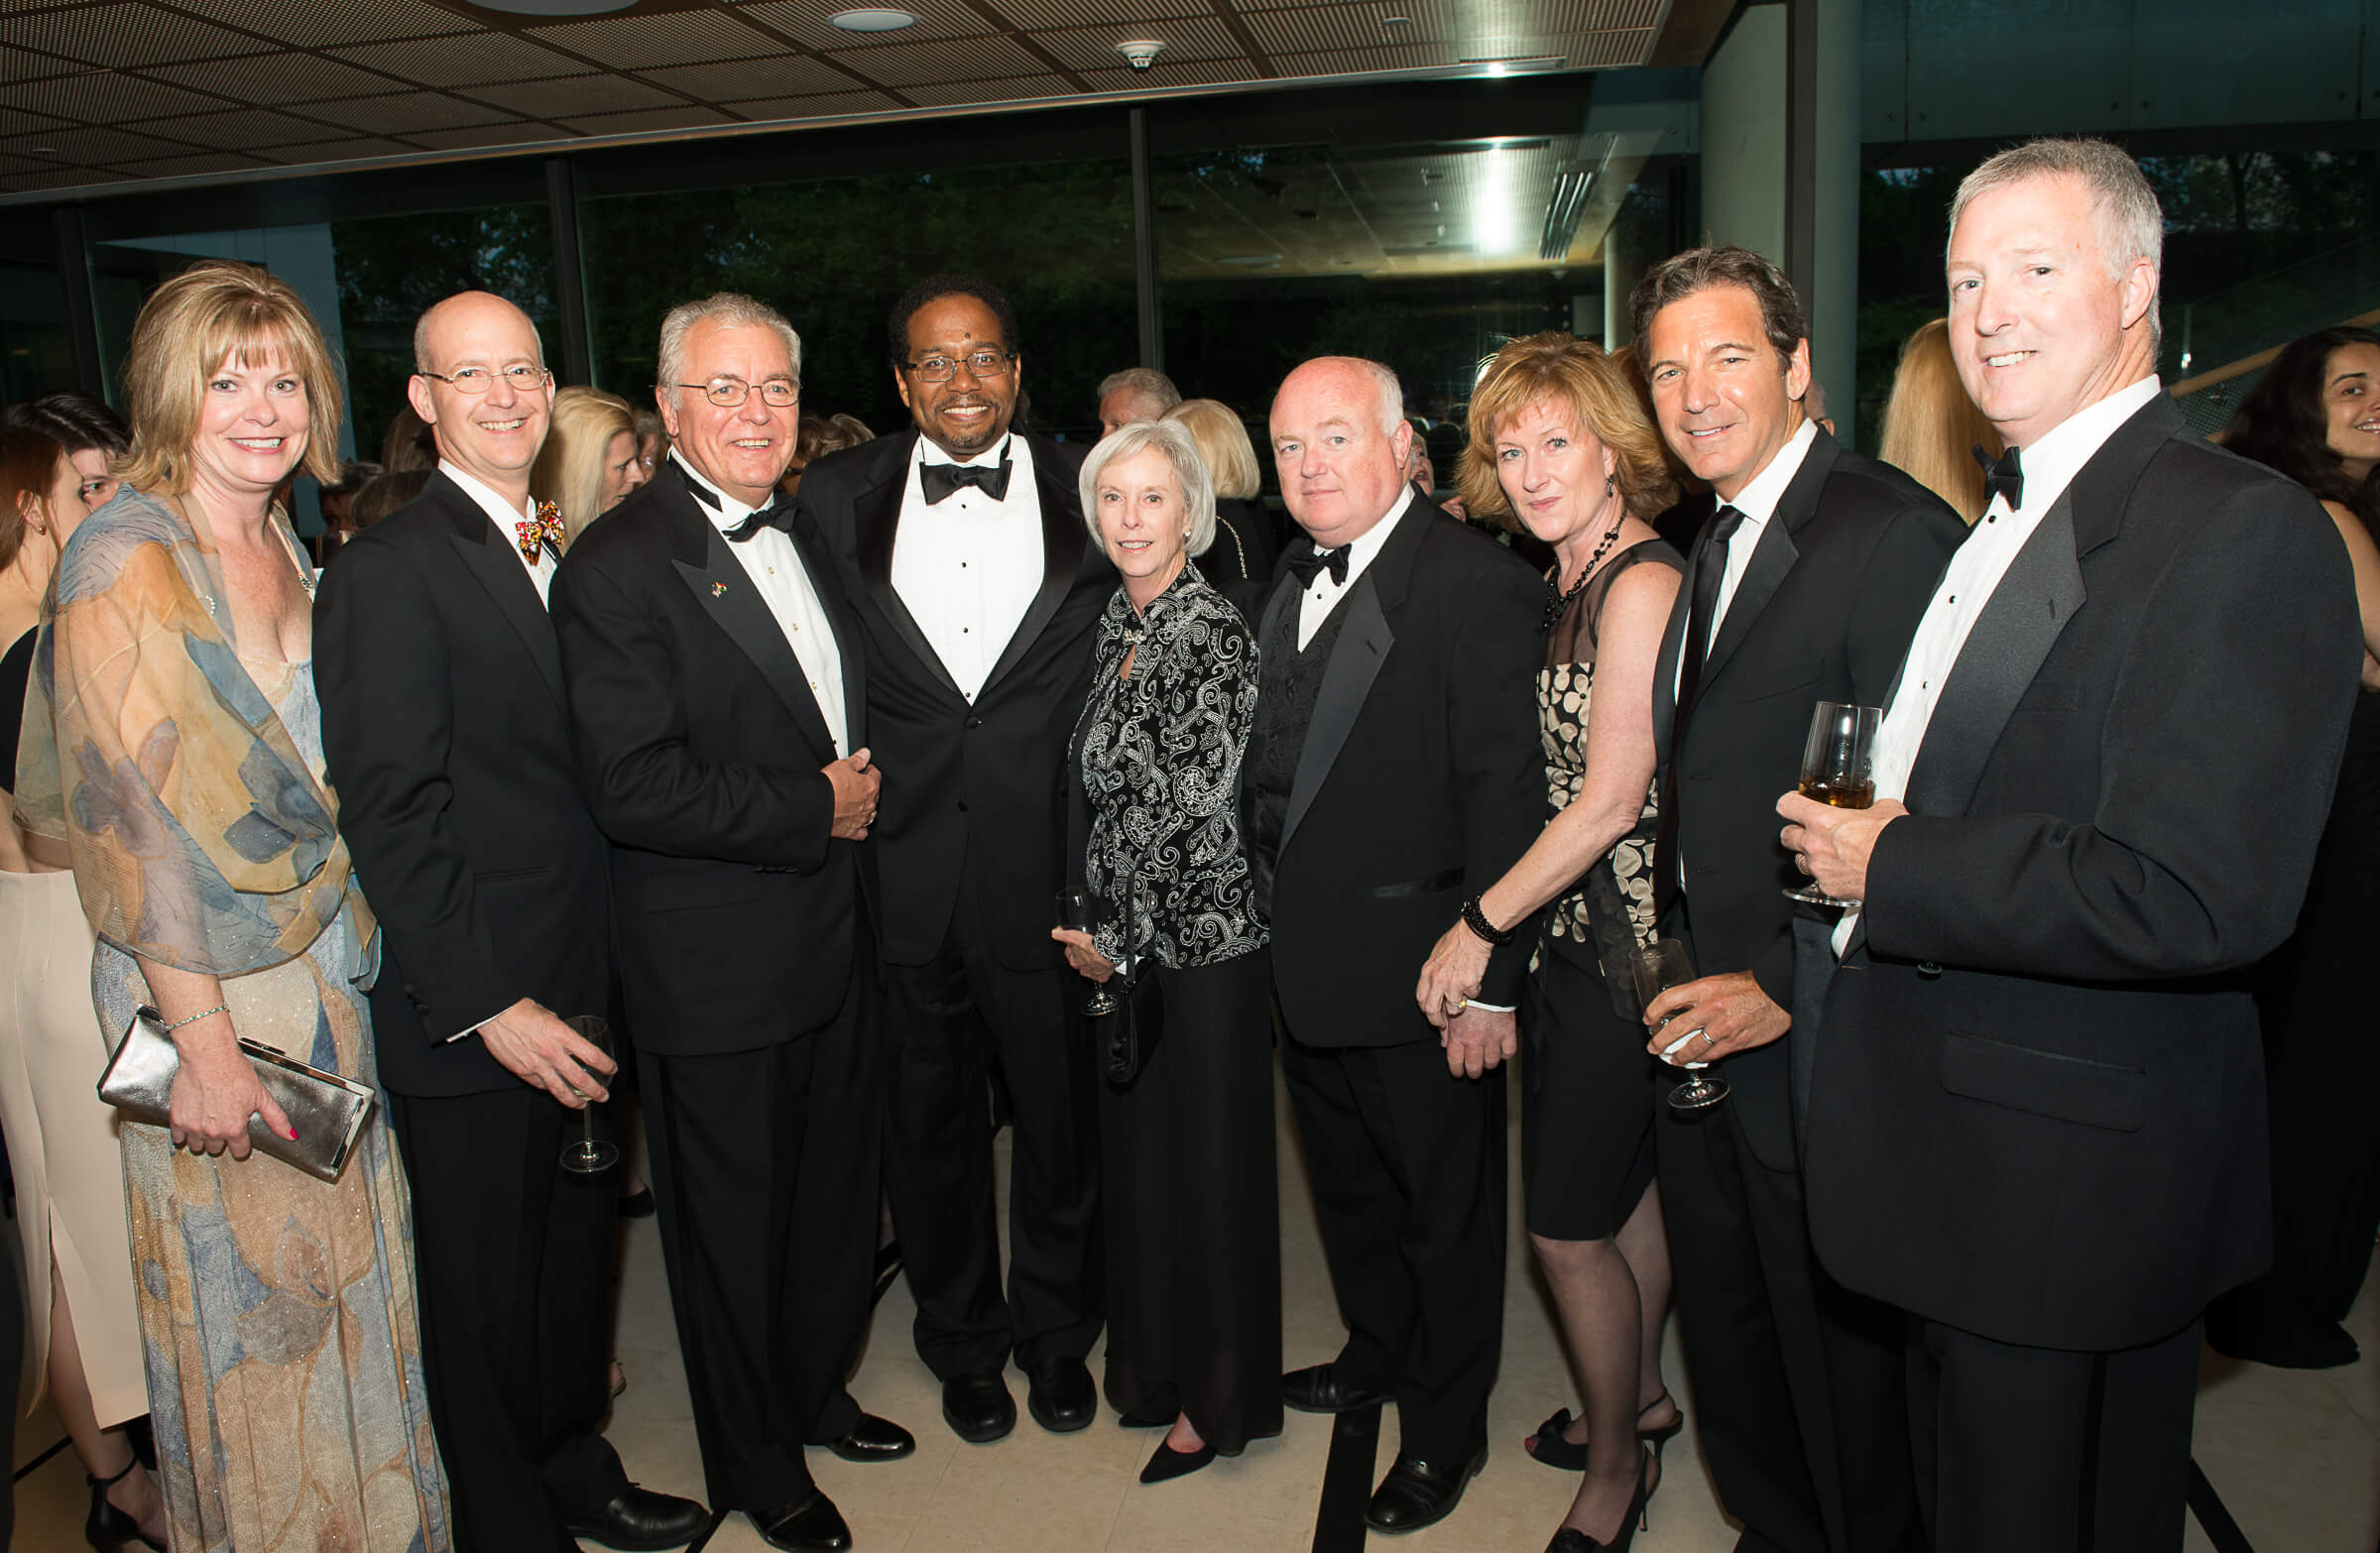 University of Maryland Friends Debbie Potter, Ross Stern, John N. Lauer, Daryl Pines, Barbara Quinn, Tim Mahoney, Sheila Mahoney, Marvin Rabovsky, Michael Quinn